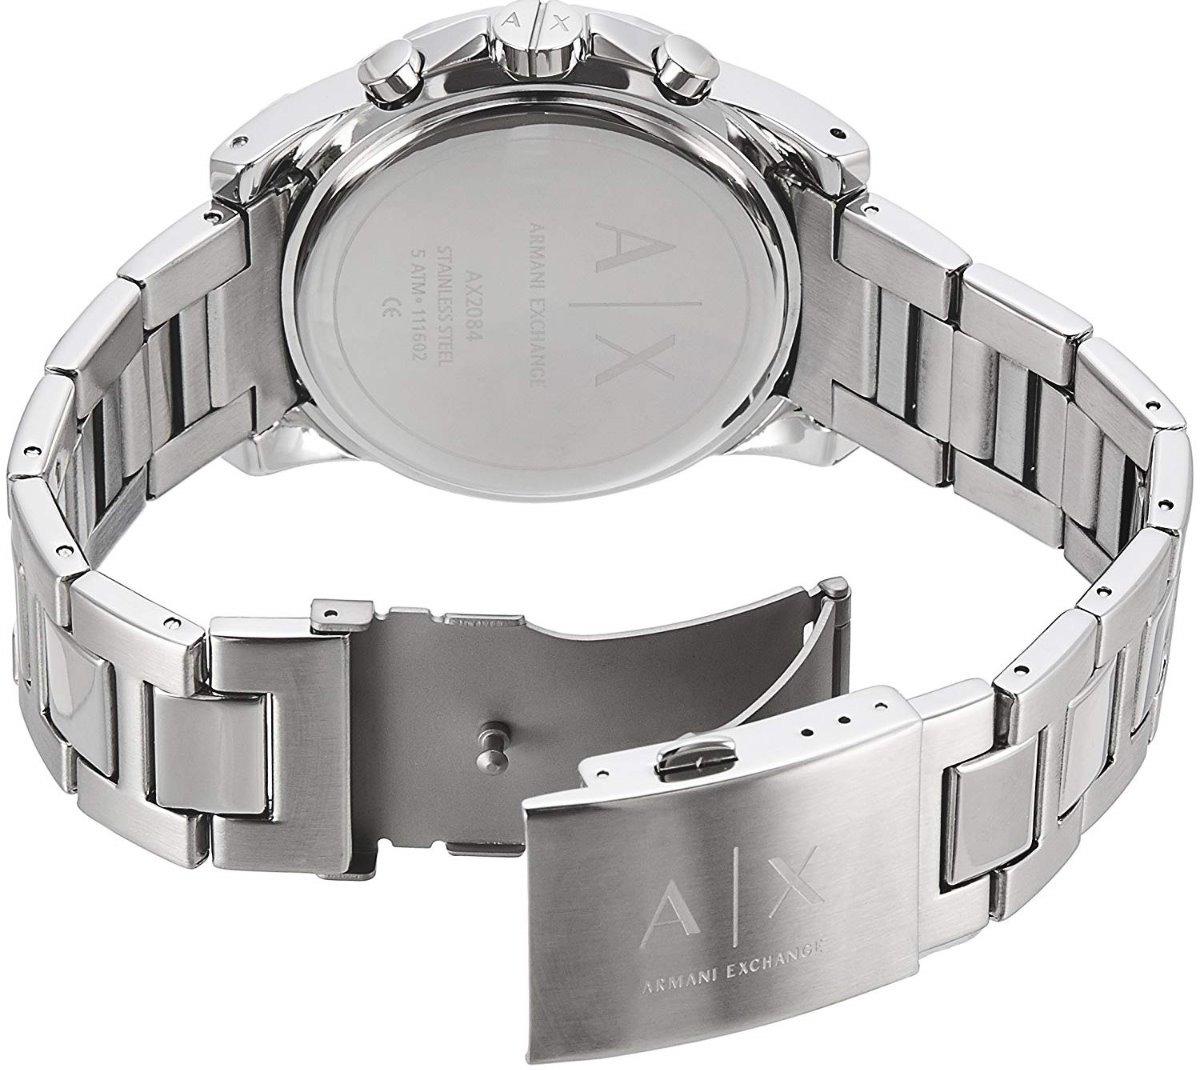 2e8a0dd52db Reloj Armani Exchange Ax2084 Chrono Acero Plateado Hombre ...